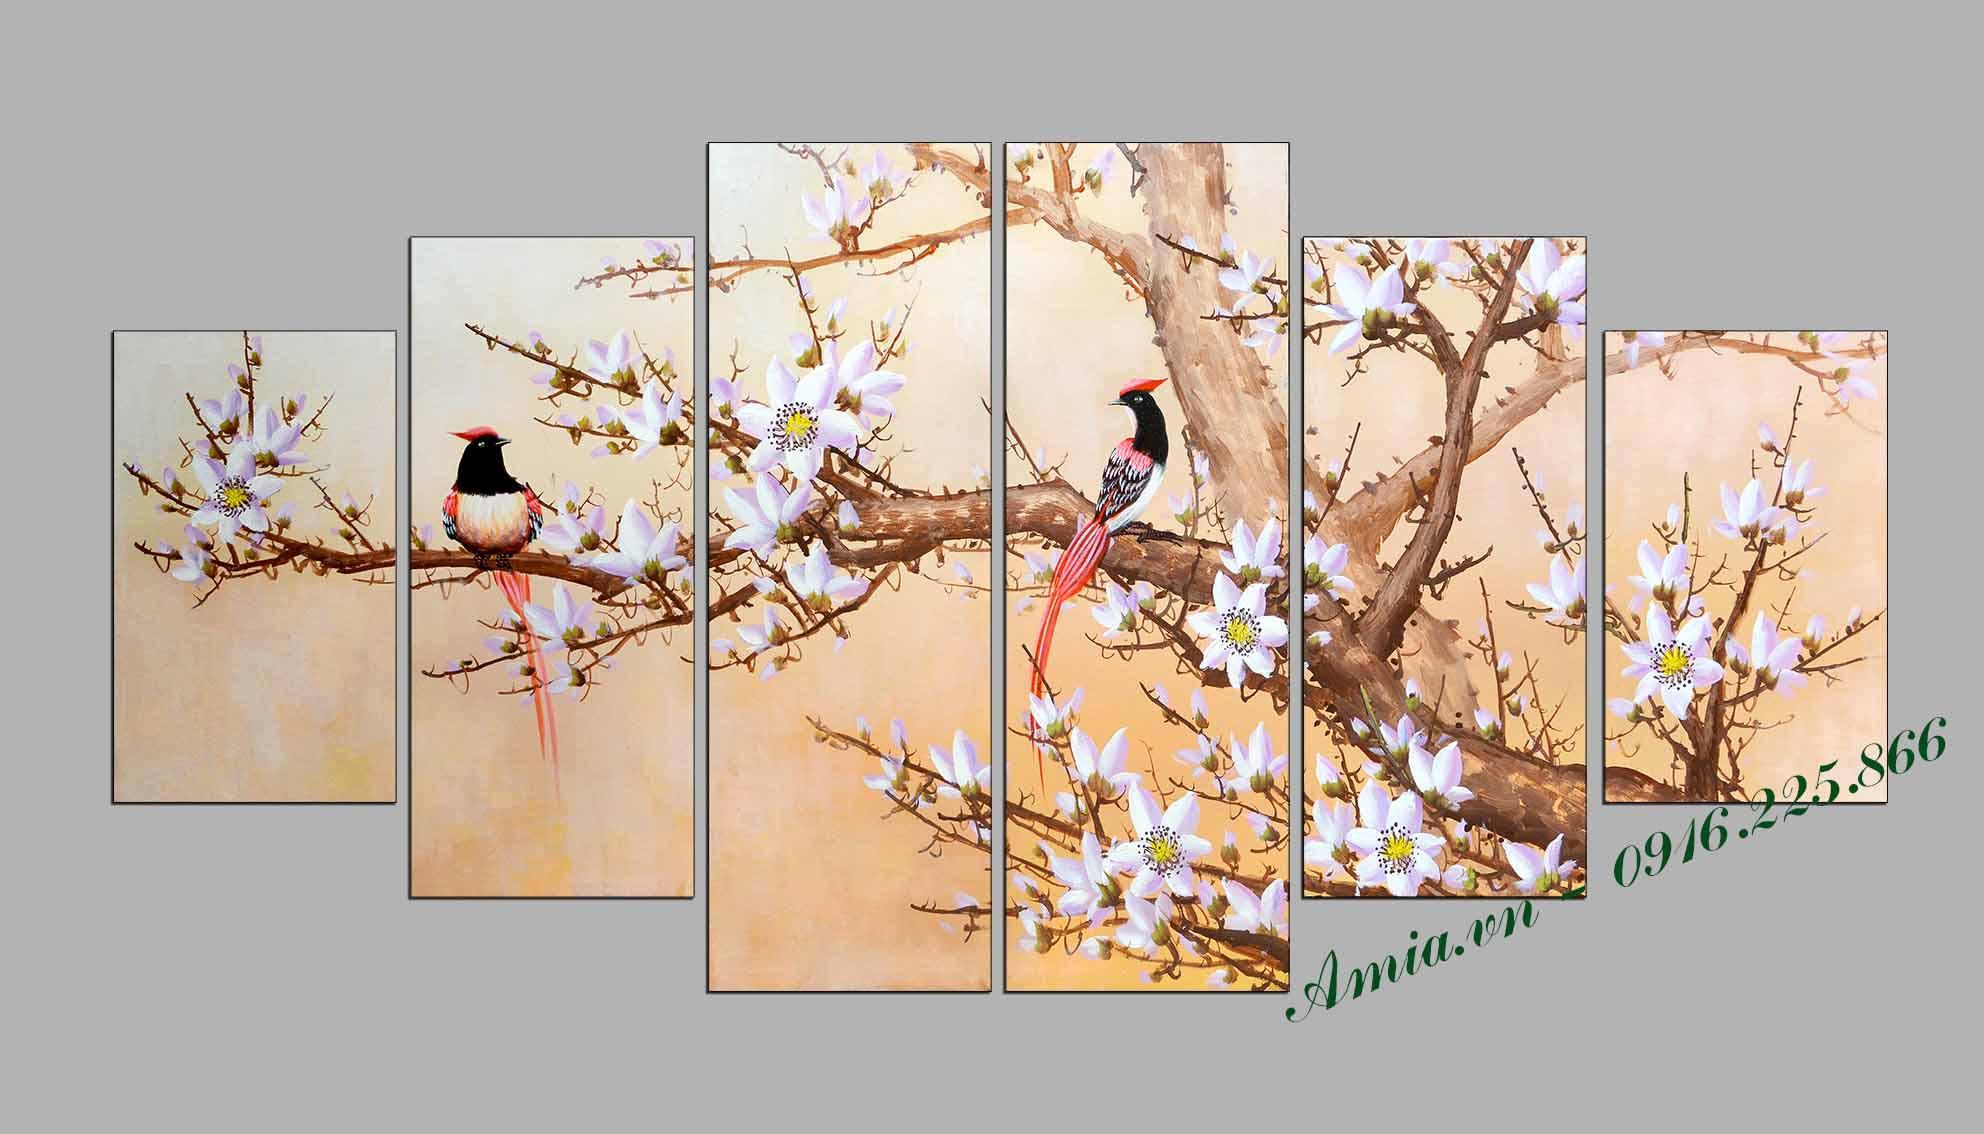 tranh xuan doi chim sum vay dep hop menh Hoa thuoc hanh Moc phong thuy